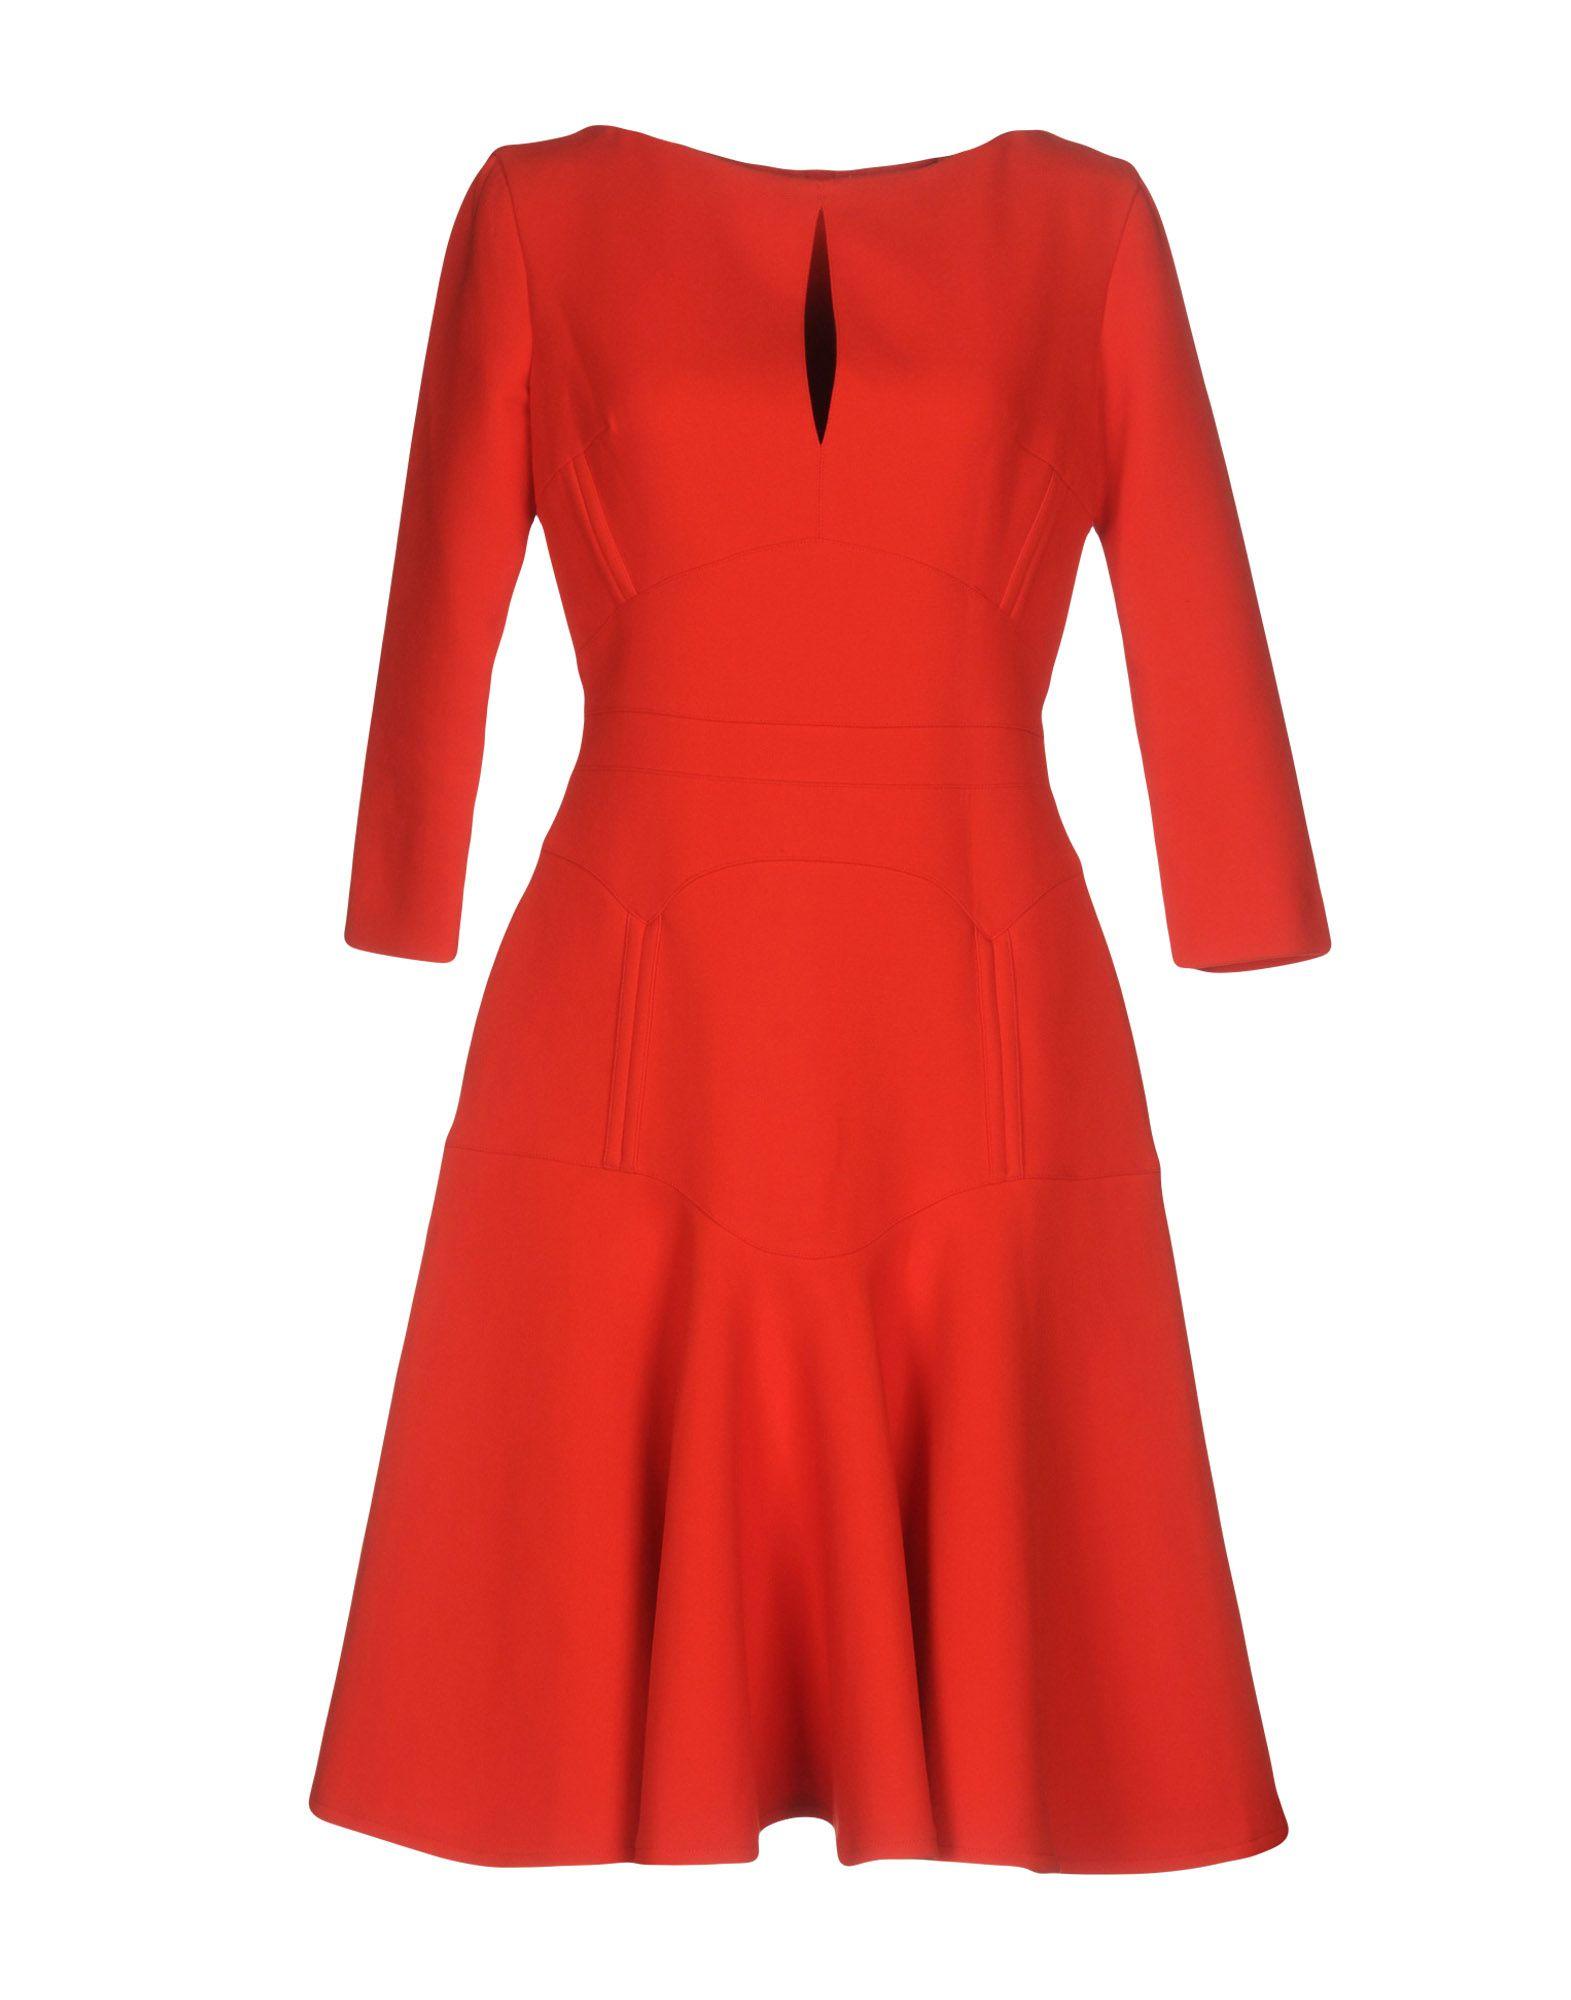 ELIE SAAB Платье до колена вечернее платье backless evening dresses sequin elie saab z2013122702